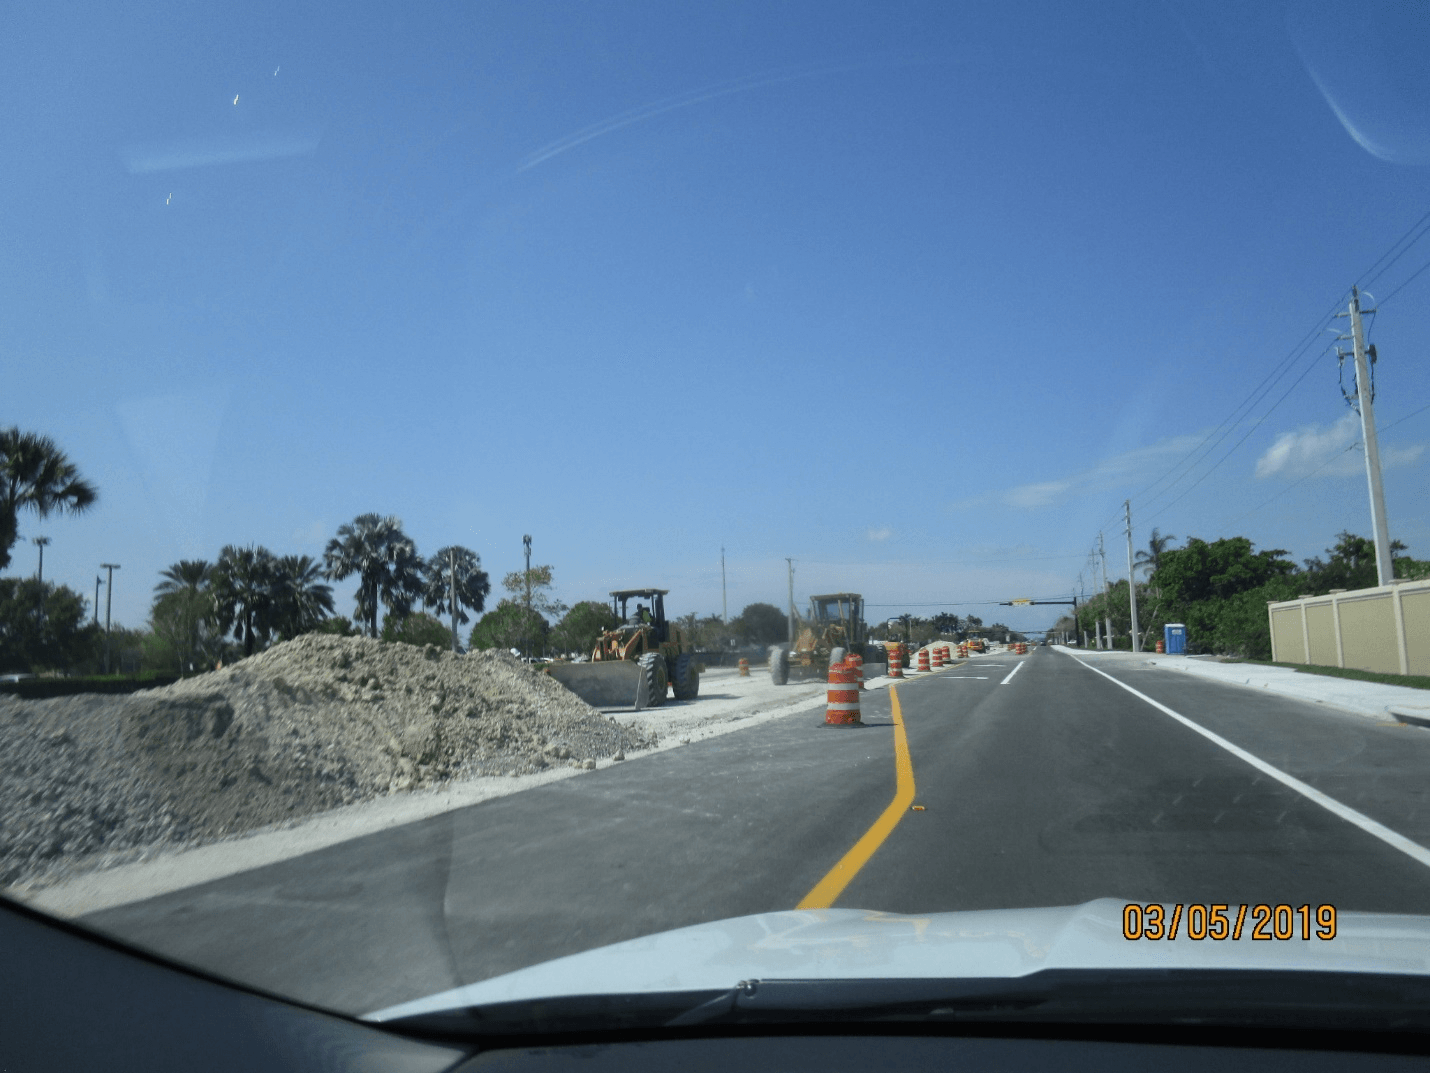 FDOT/BROWARD COUNTY Projects | Miramar, FL - Official Website